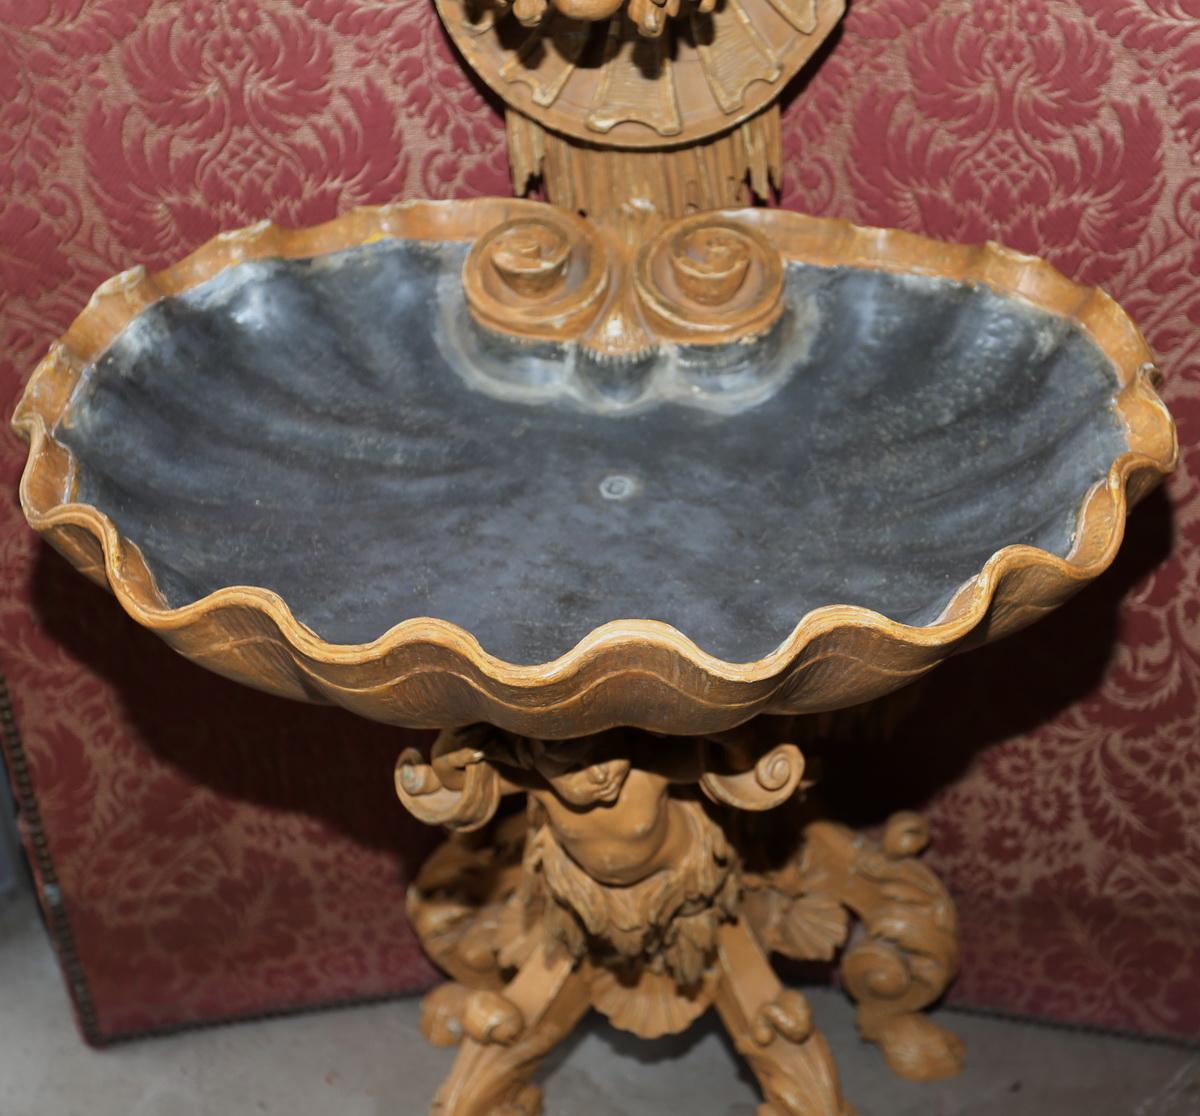 Rococo style fountain, XIXth.